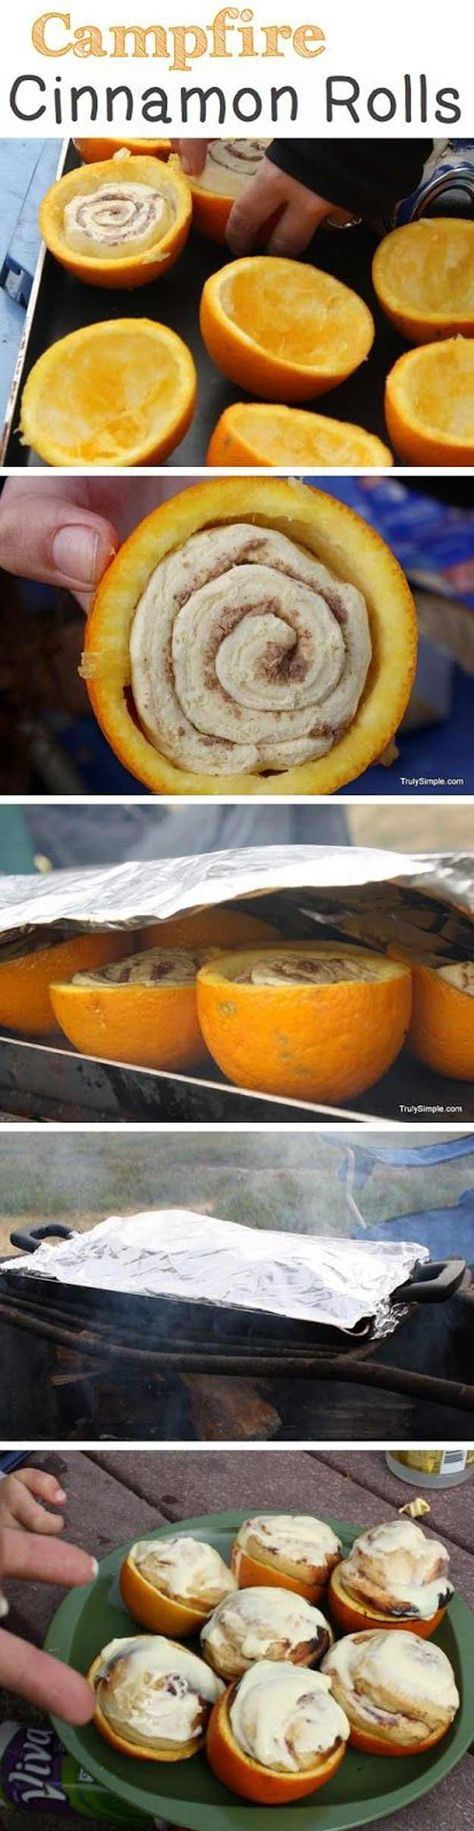 Campfire Cinnamon Rolls | 18 Mouthwatering Breakfast Recipes